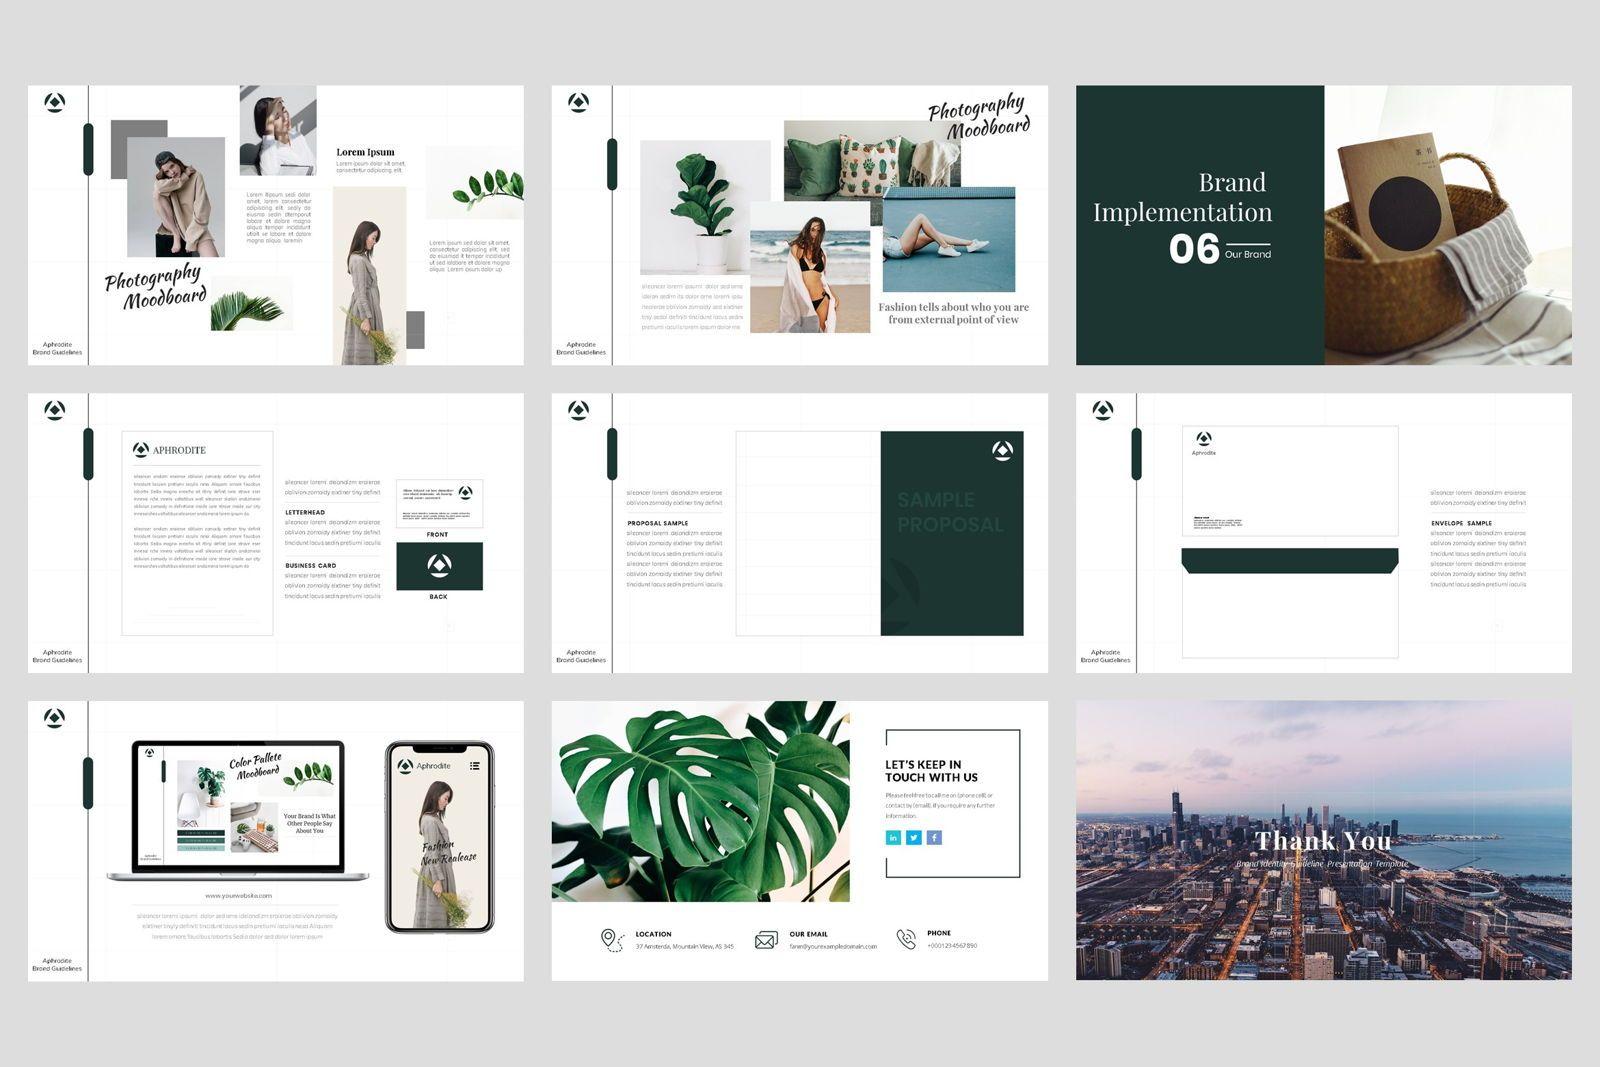 Brand Identity Guideline Google Slide Template, Slide 5, 08563, Presentation Templates — PoweredTemplate.com